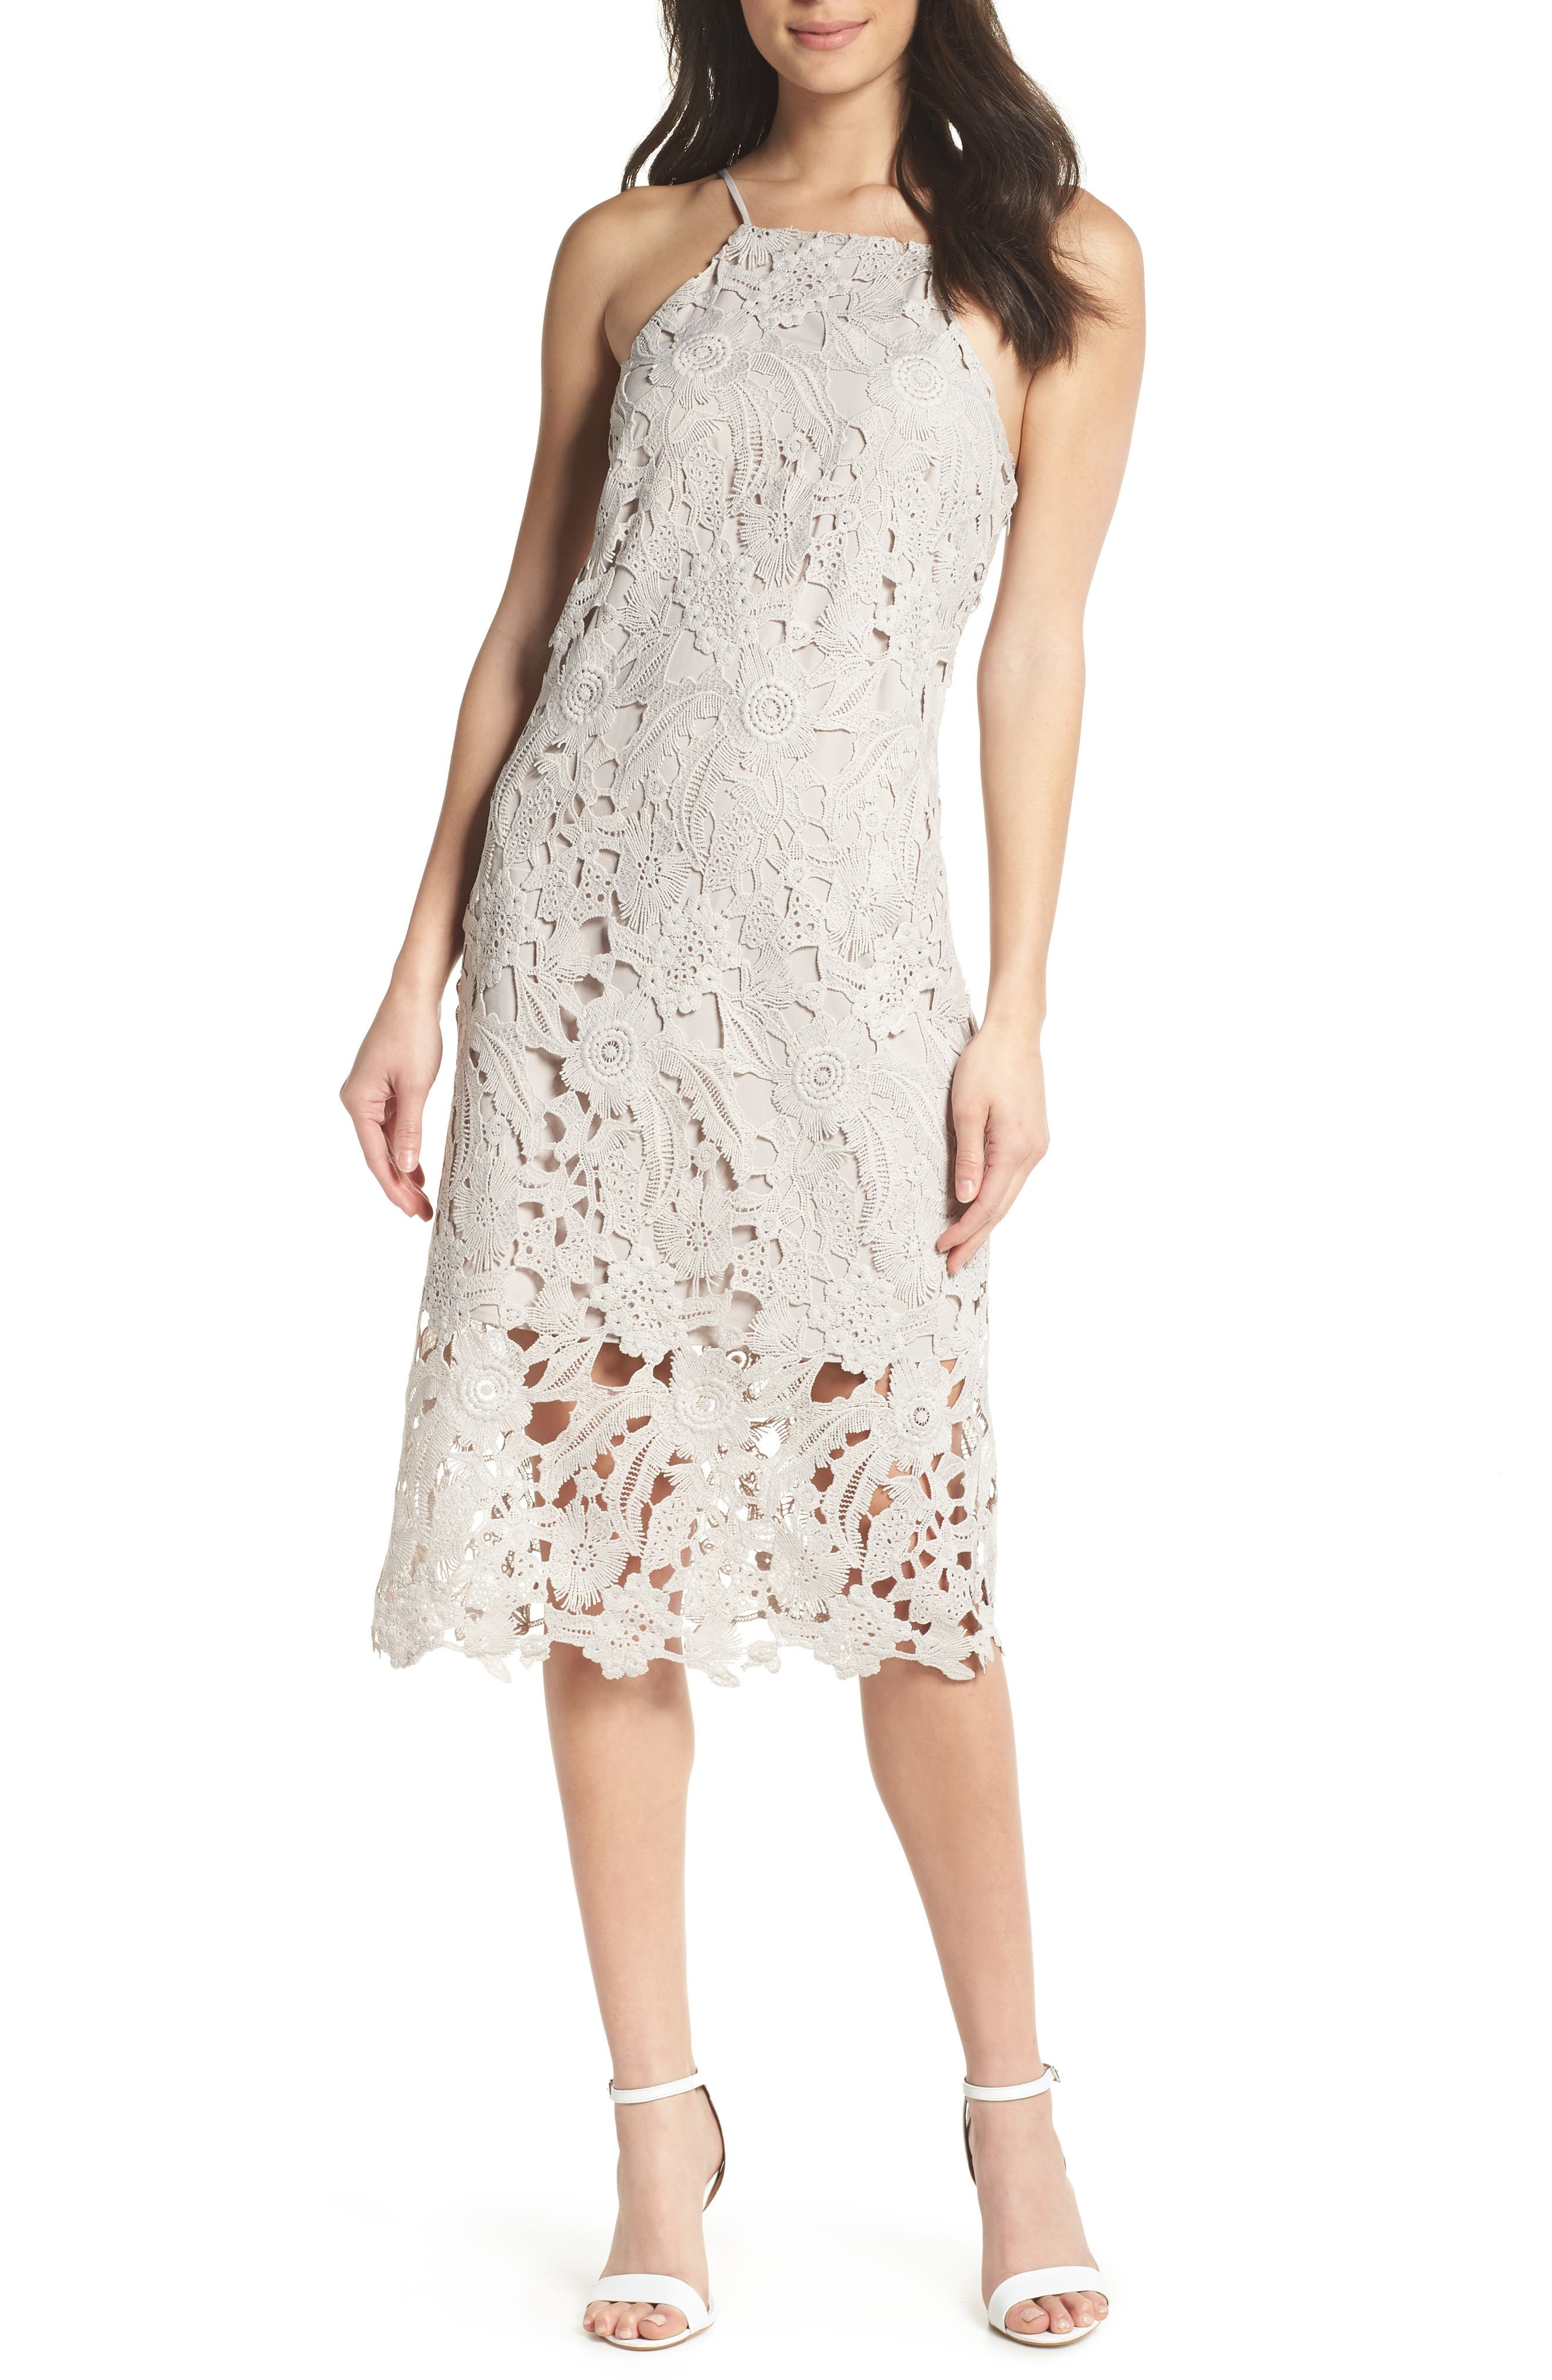 Sam Edelman Halter Top Lace Dress, Beige